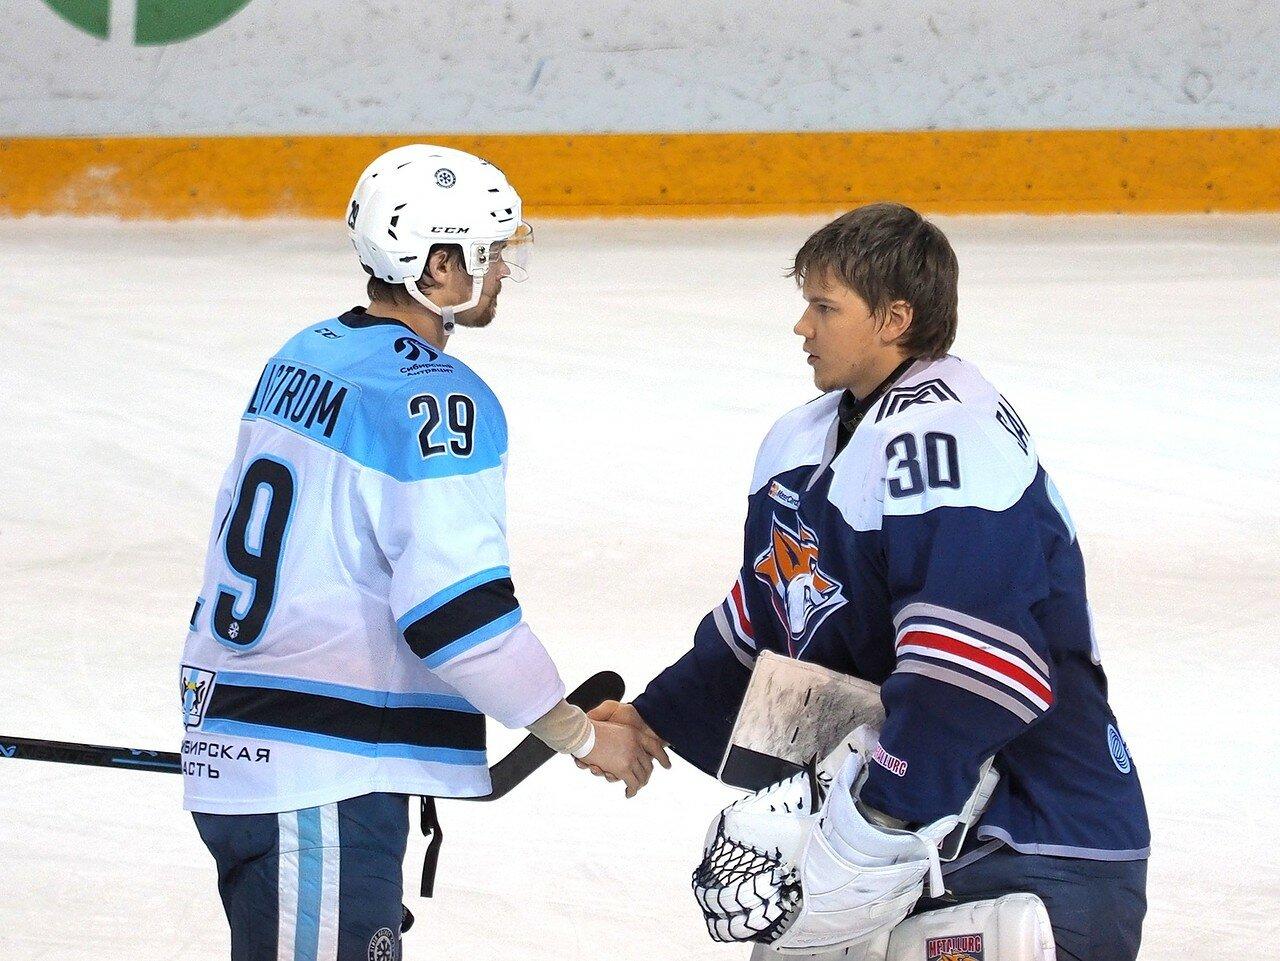 81Плей-офф 2016 Восток 1/2 Металлург - Сибирь 16.03.2016